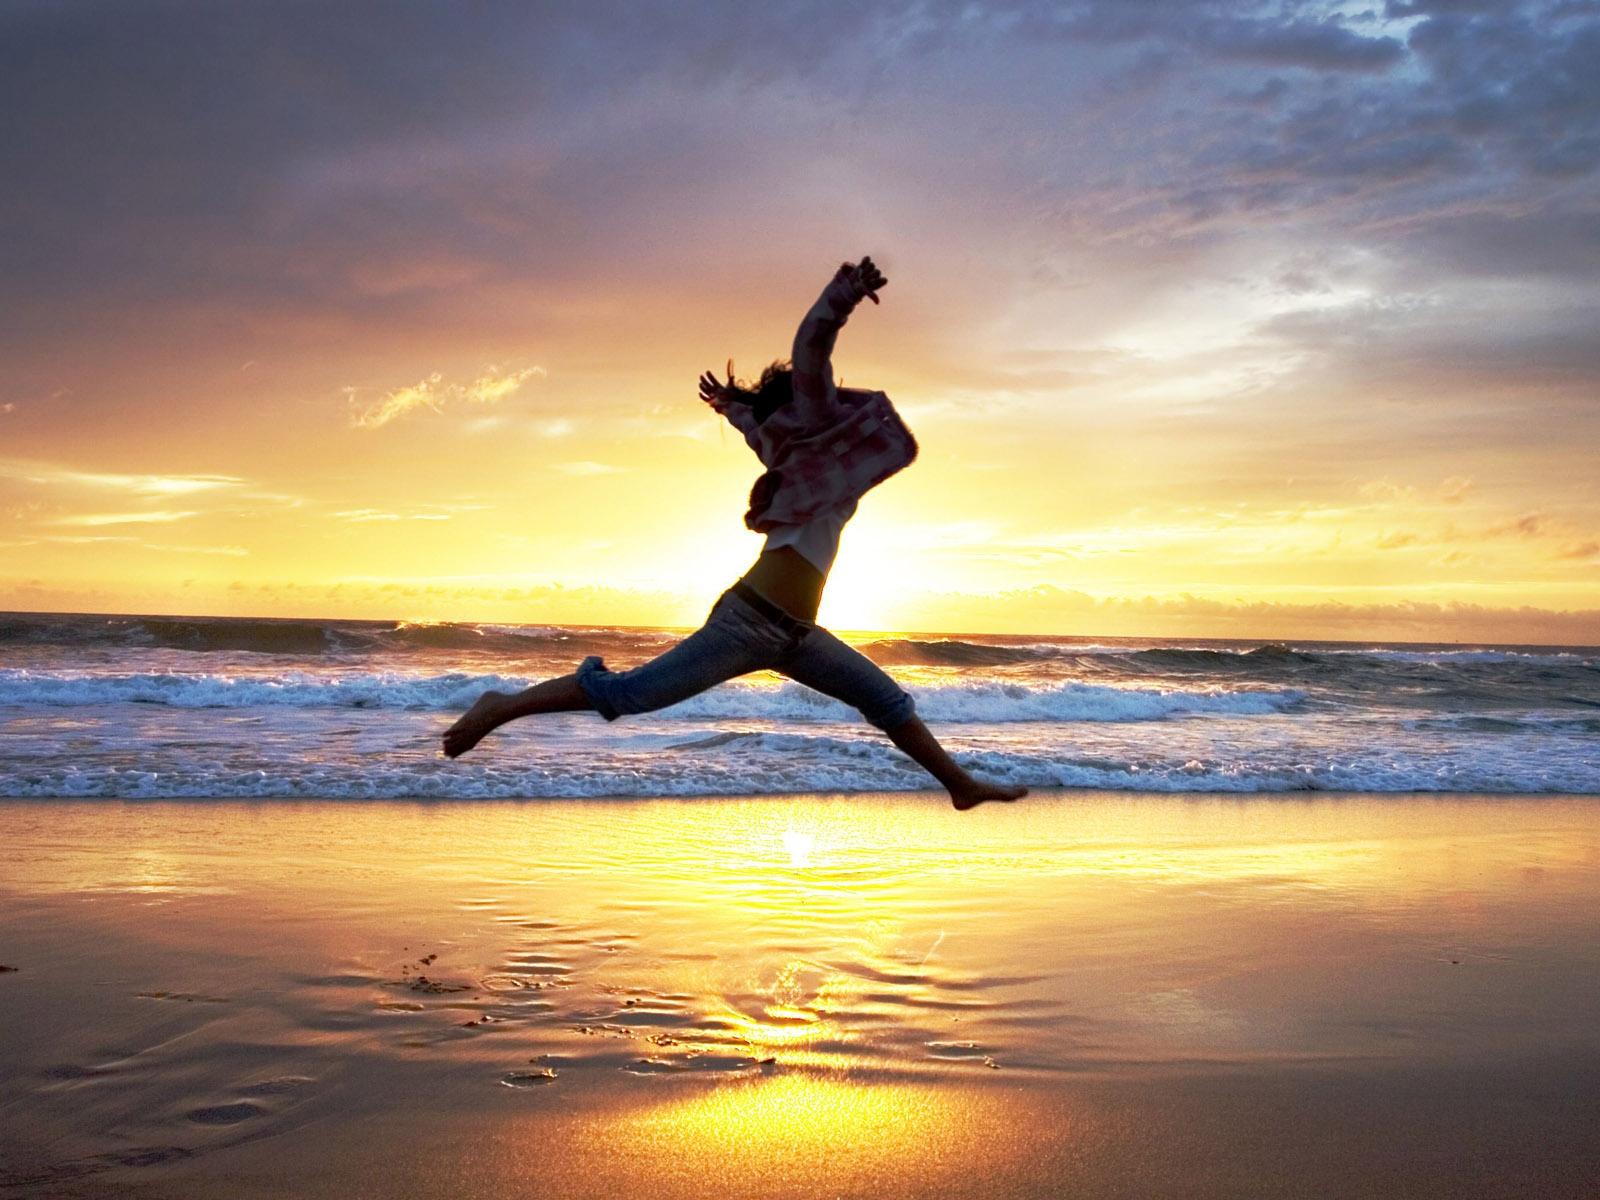 Wallpaper : beach, people, jump, sunset, sea 1600x1200 ...